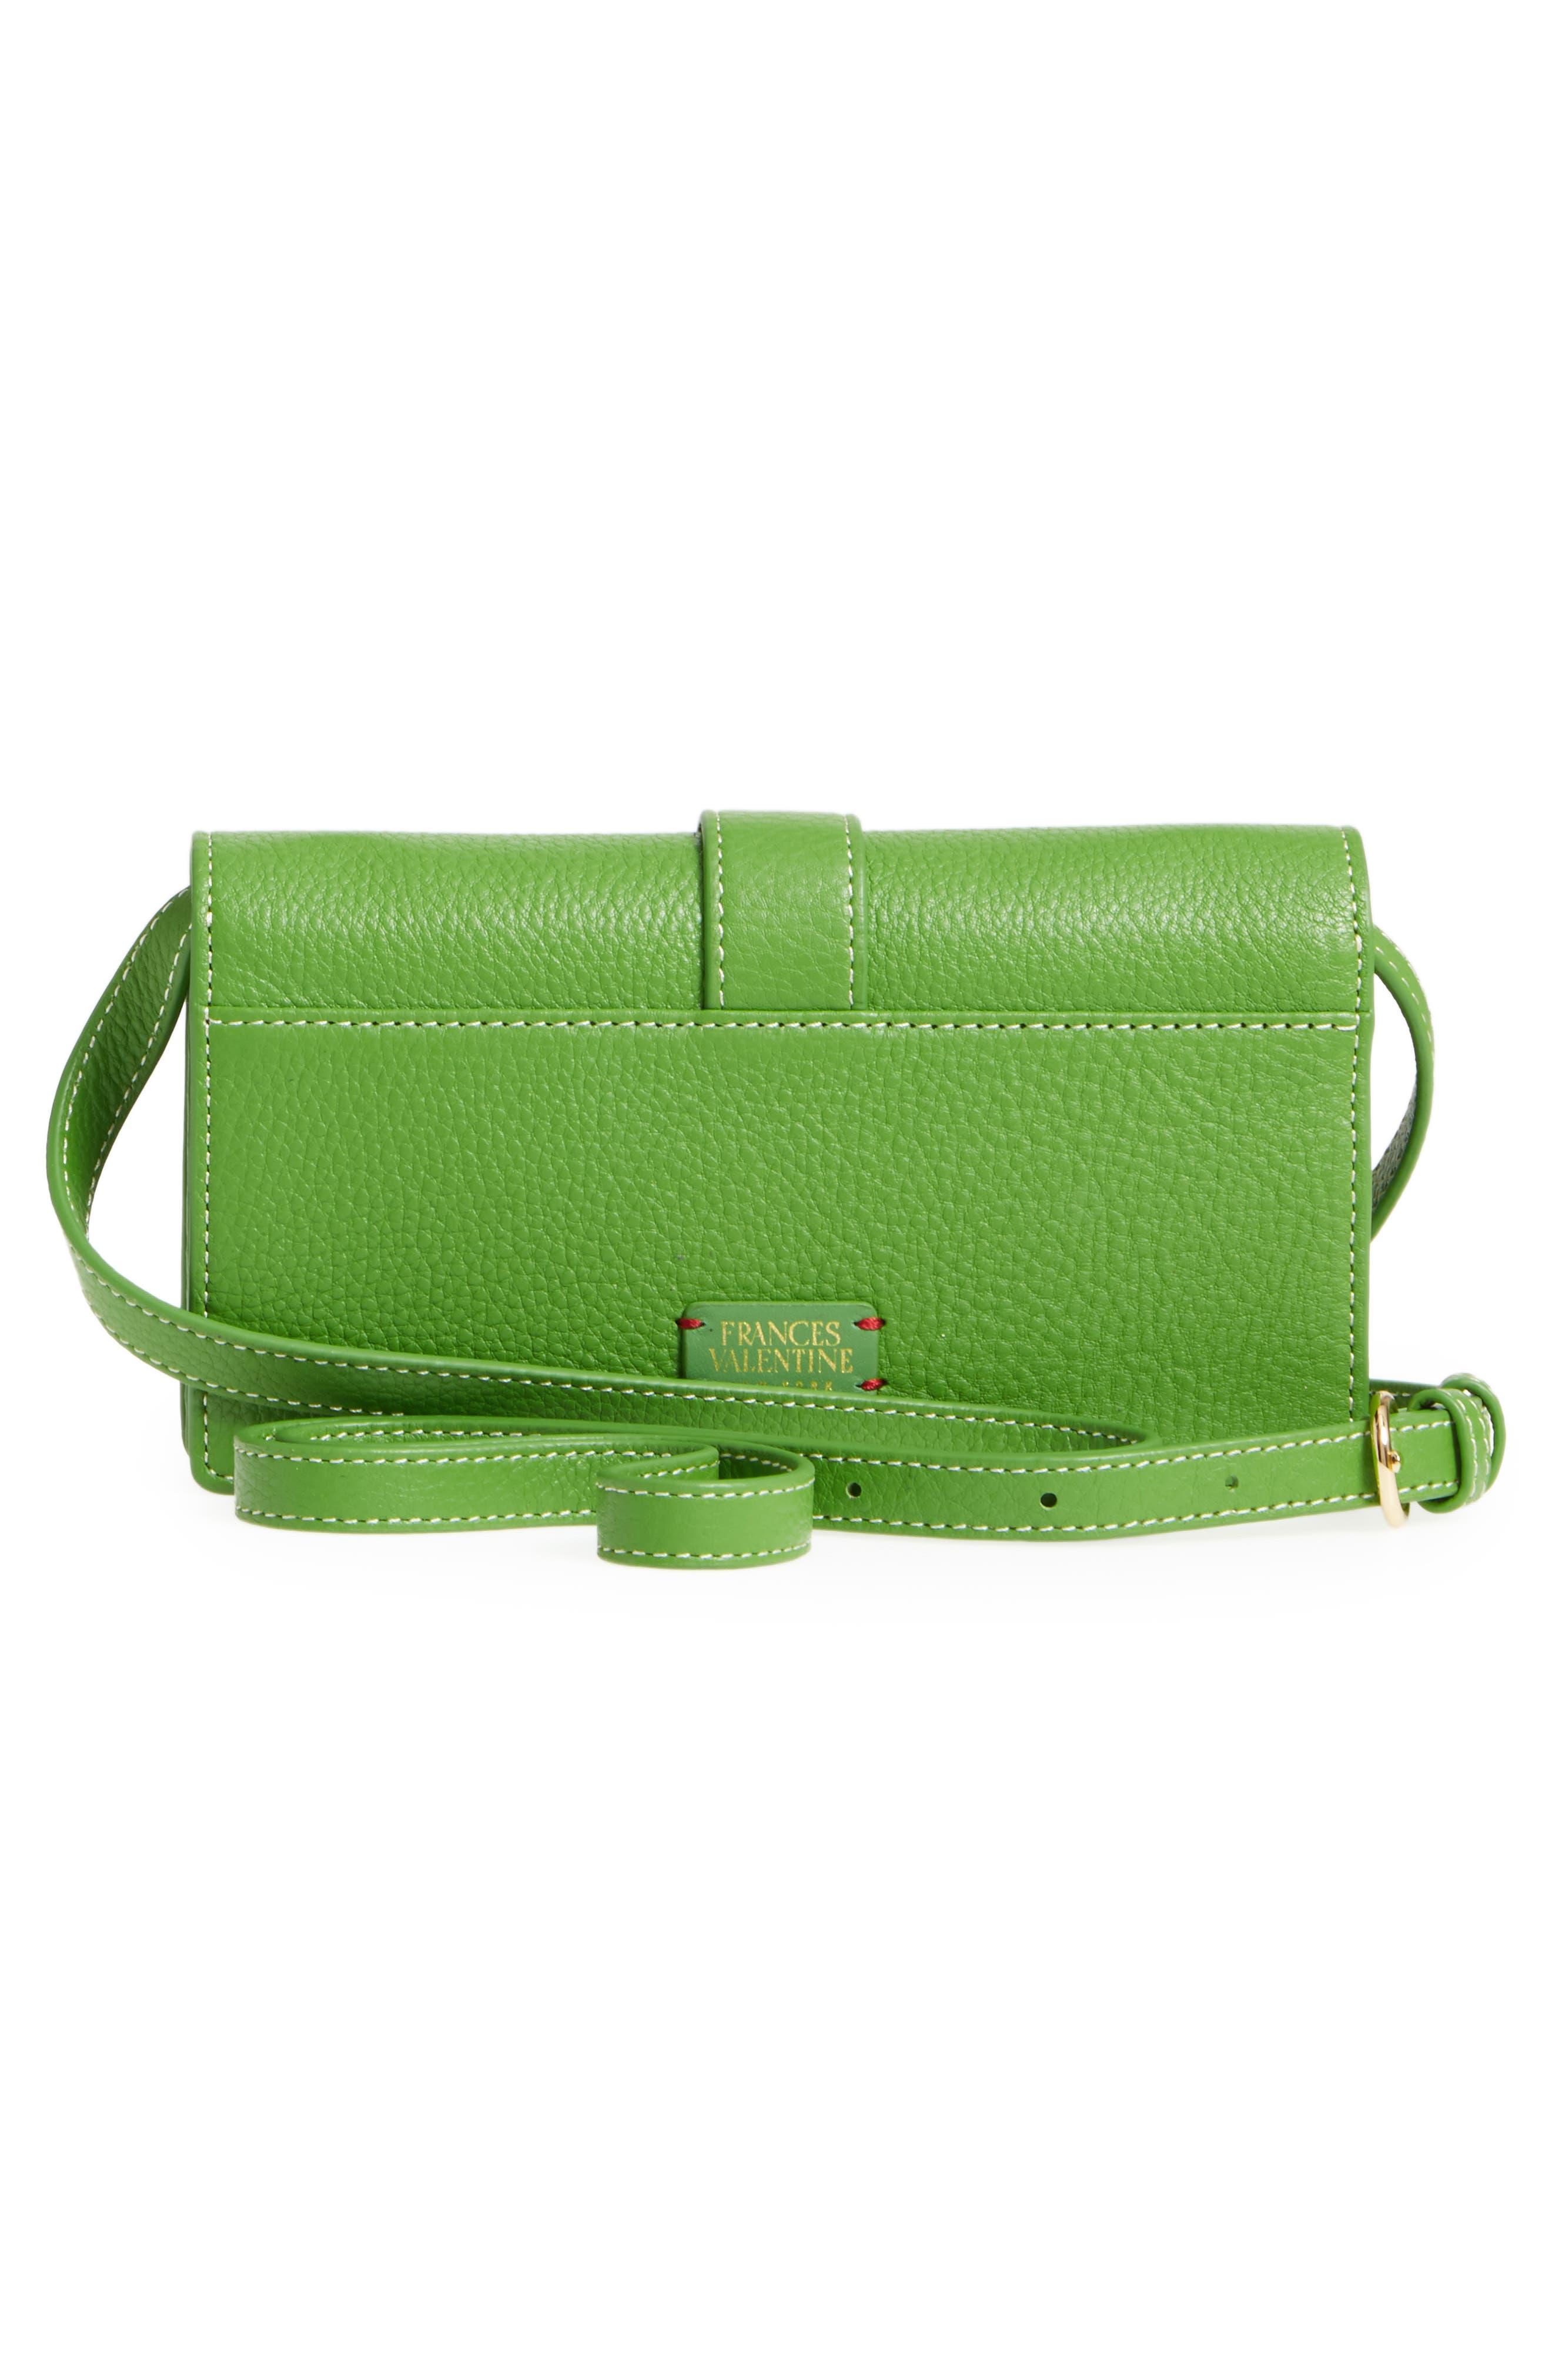 Calfskin Leather Crossbody Wallet,                             Alternate thumbnail 11, color,